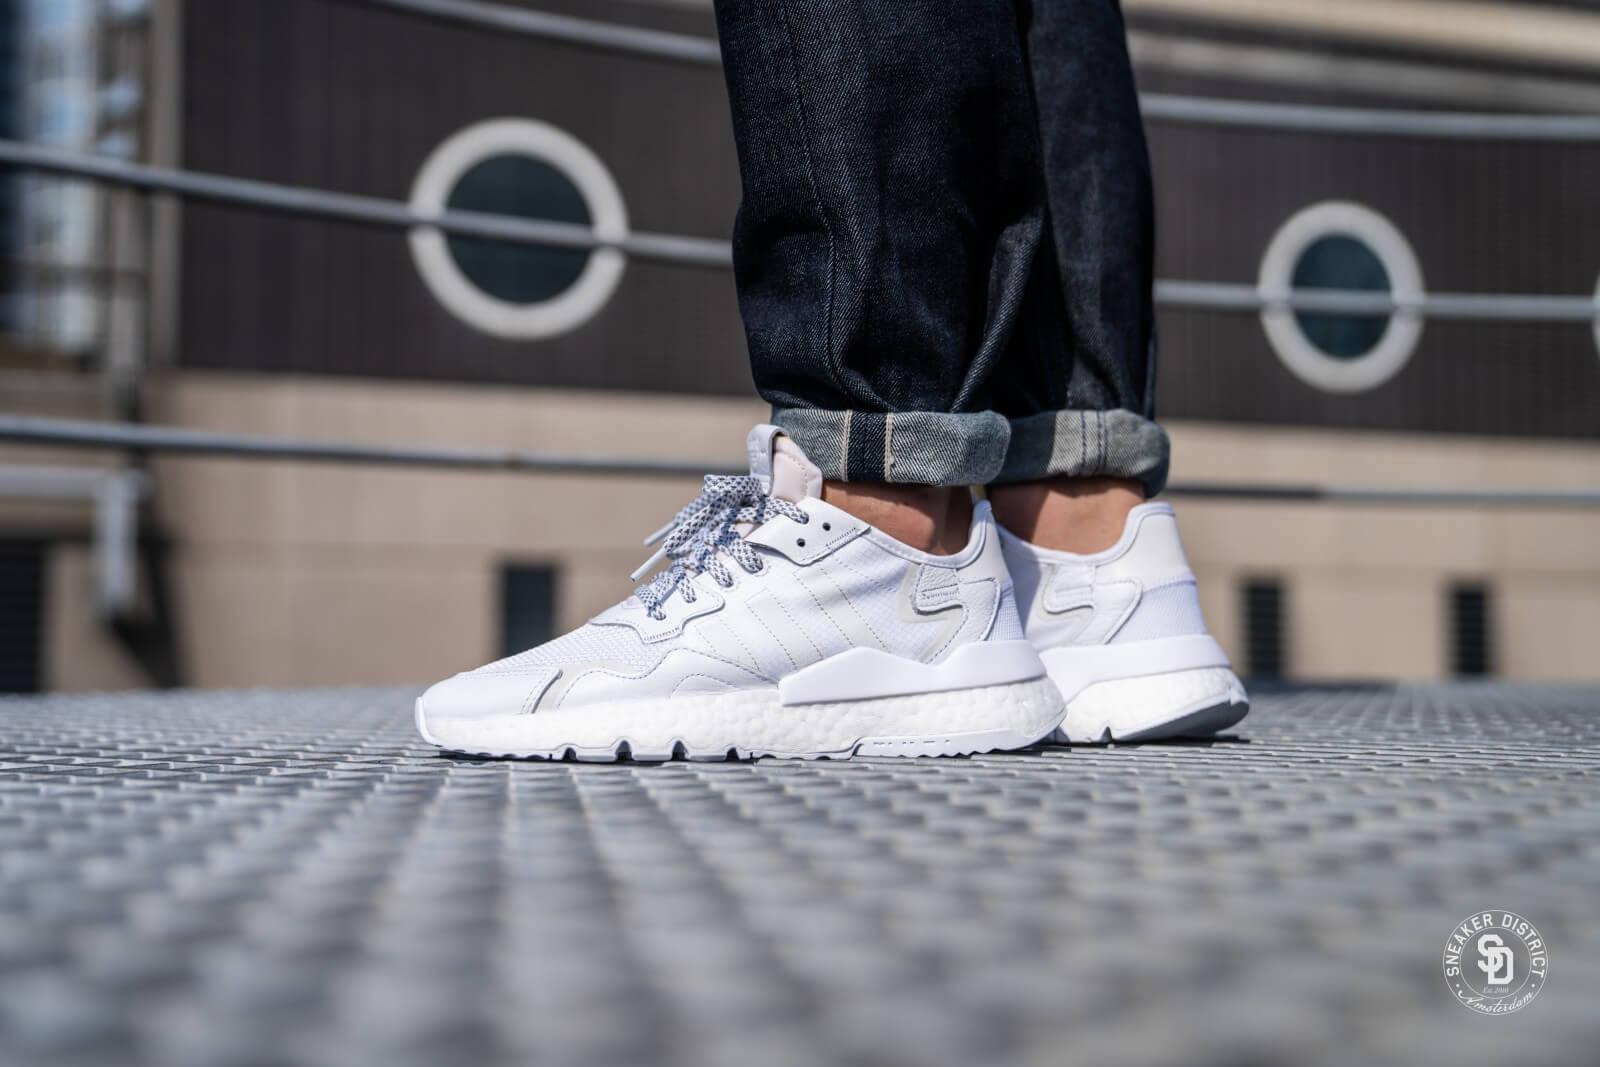 Adidas Nite Jogger Cloud White/Crystal White - BD7676